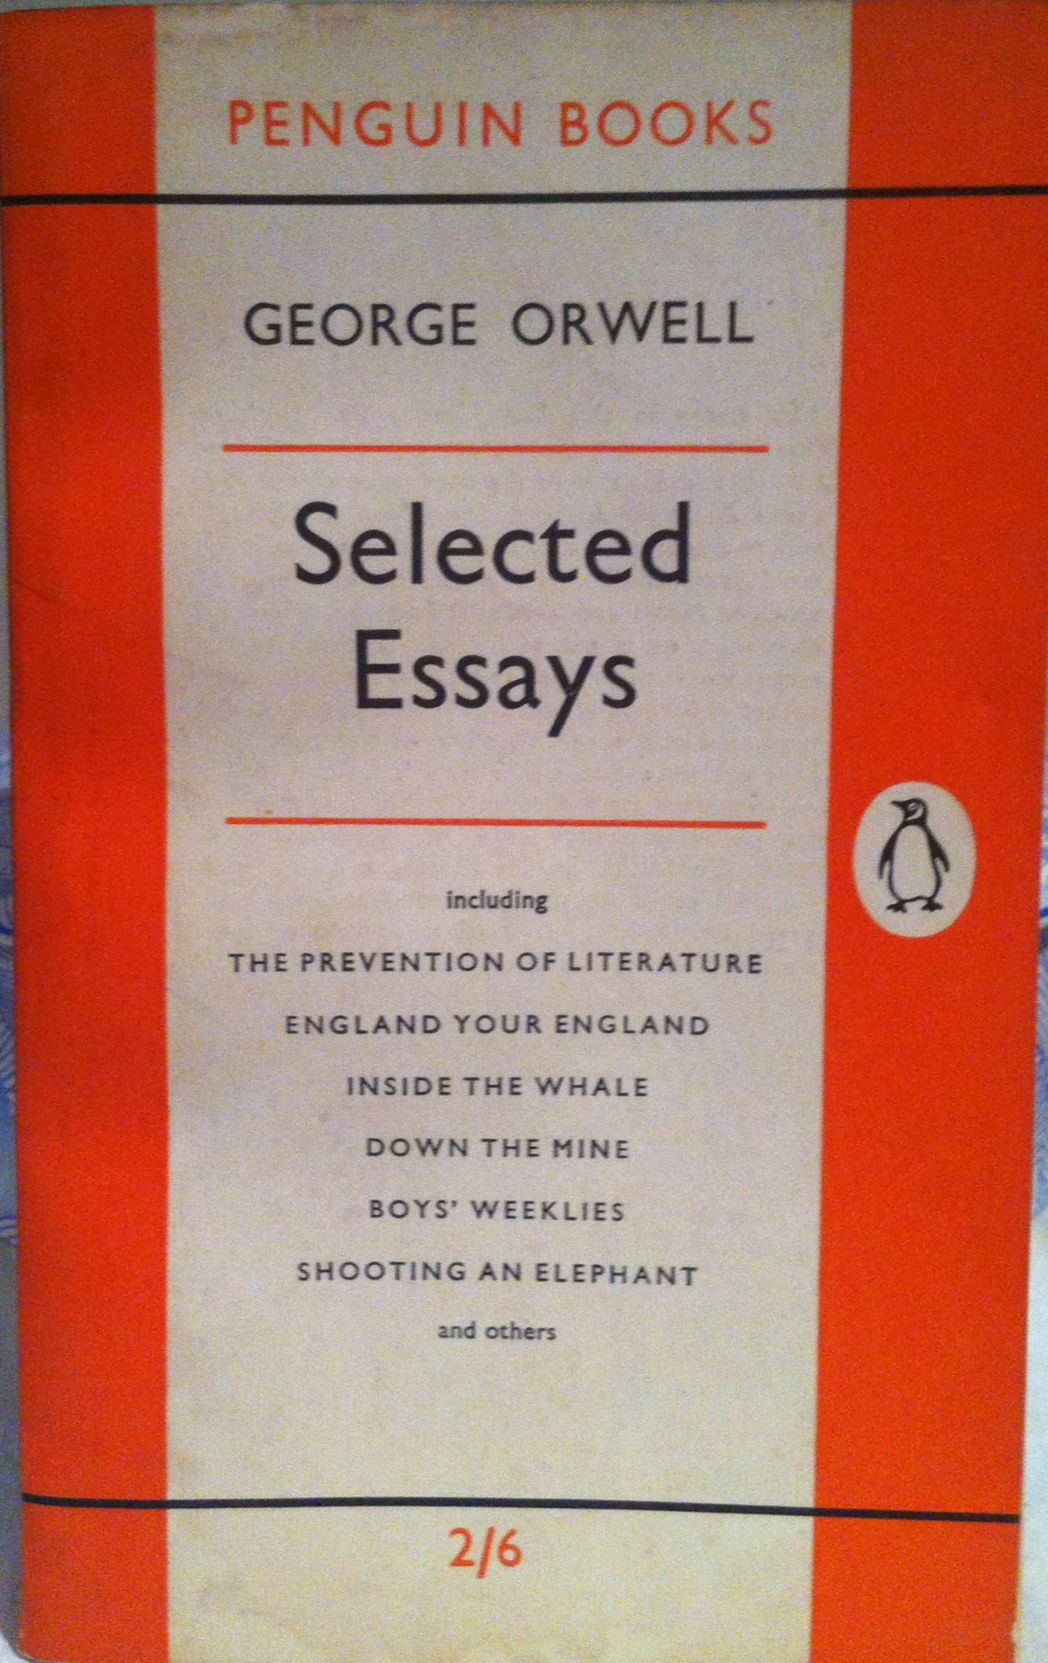 george orwell selected essays 1957 thingstodo george orwell selected essays 1957